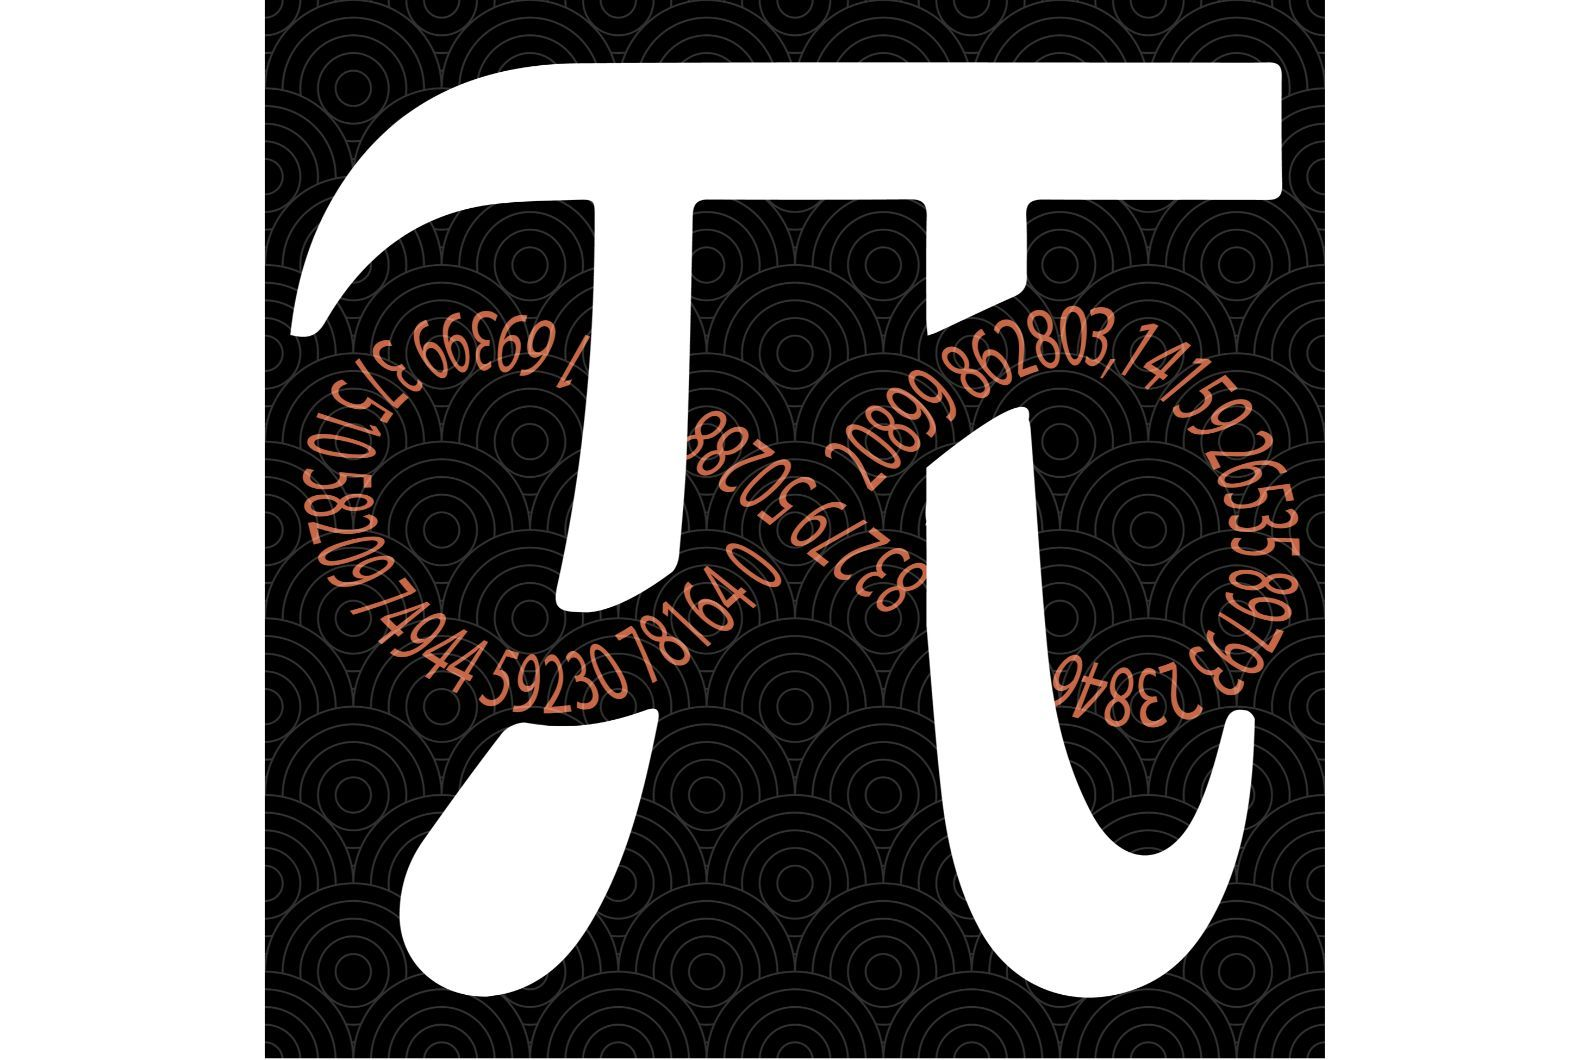 Pi Day Svg Pi Symbol 2 Math Gift Math Teacher Gift Math Lover Svg Pi Svg Pi Birthday Pi Gift Pi Gift Christmas Svg Files Math Gift [ 1060 x 1590 Pixel ]